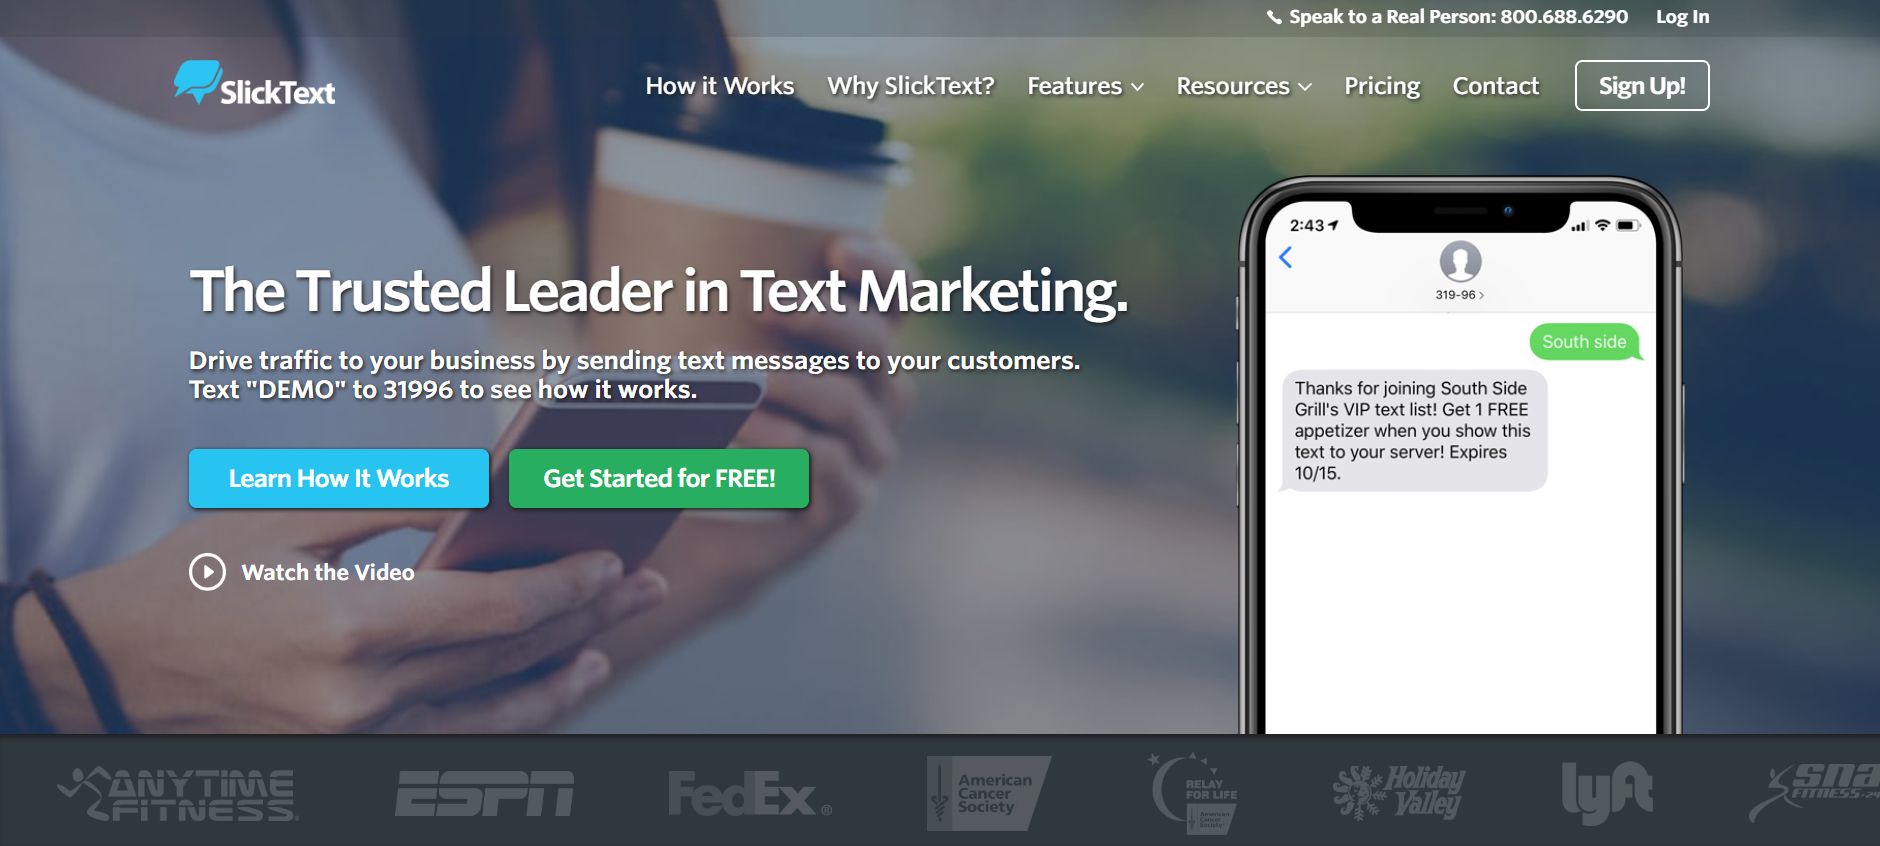 best SMS marketing services - SlickText